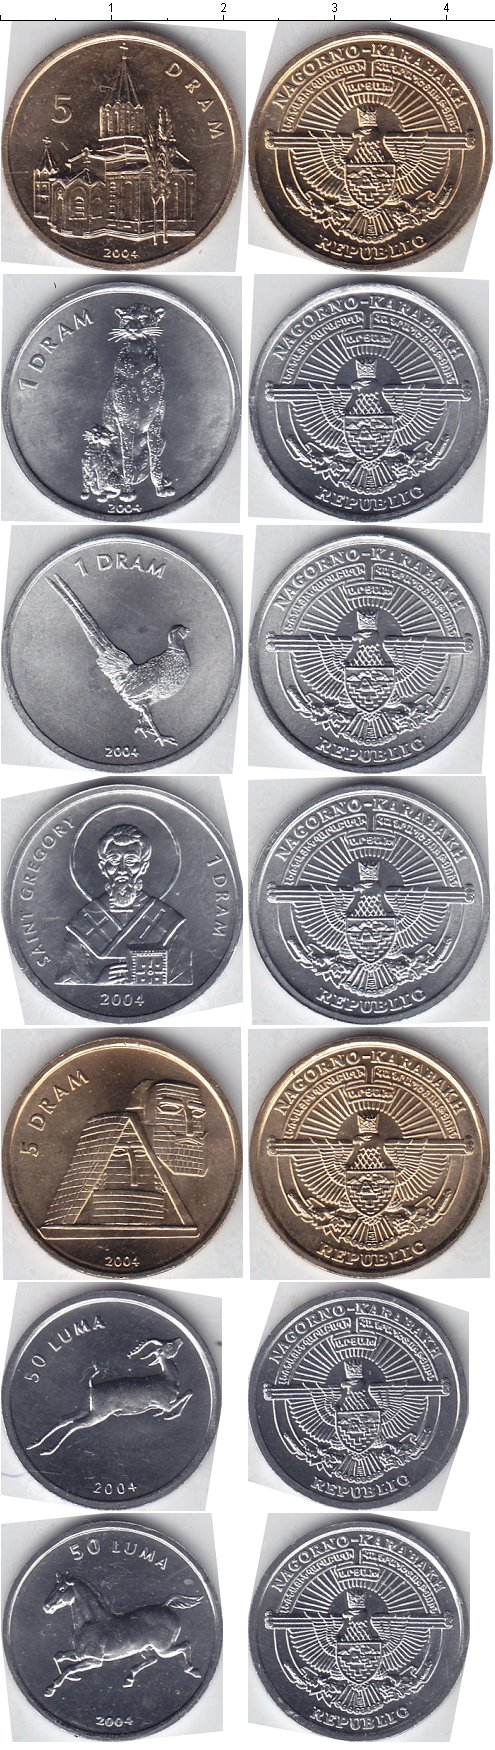 Картинка Наборы монет Нагорный Карабах Нагорный Карабах 2004  2004